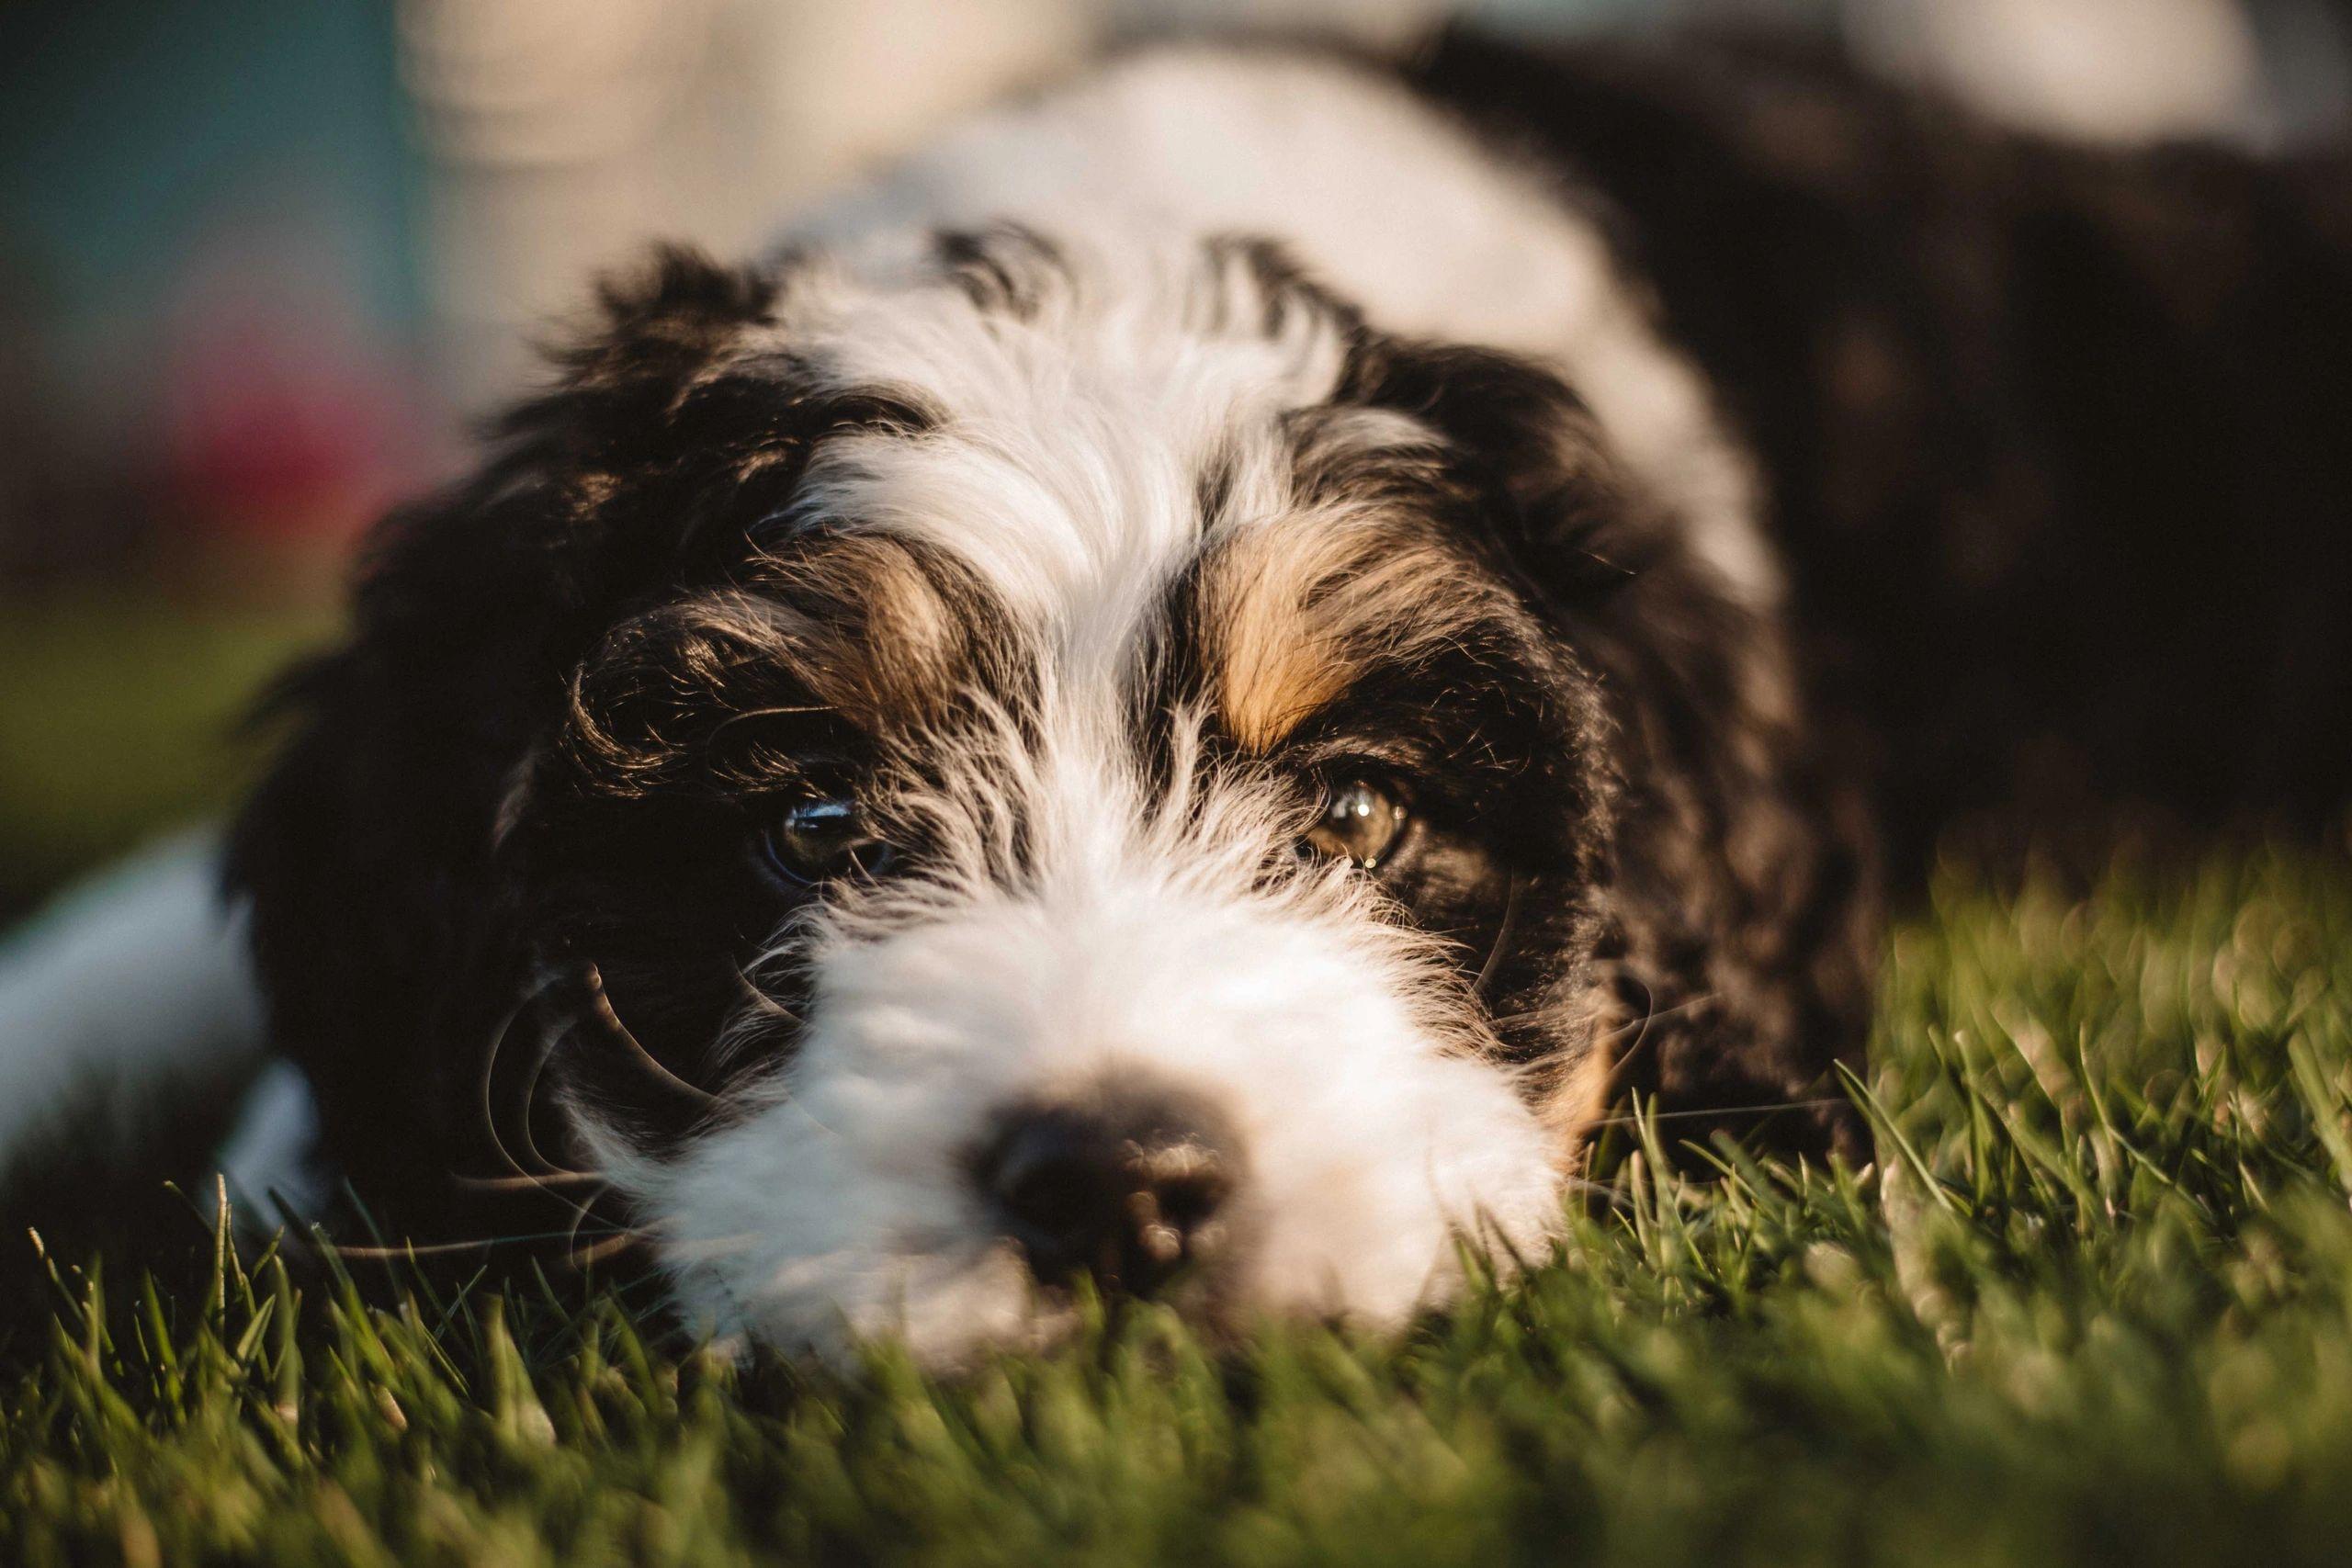 Flori Bama Small Breed Rescue - Dog Rescue, Pet Adoption